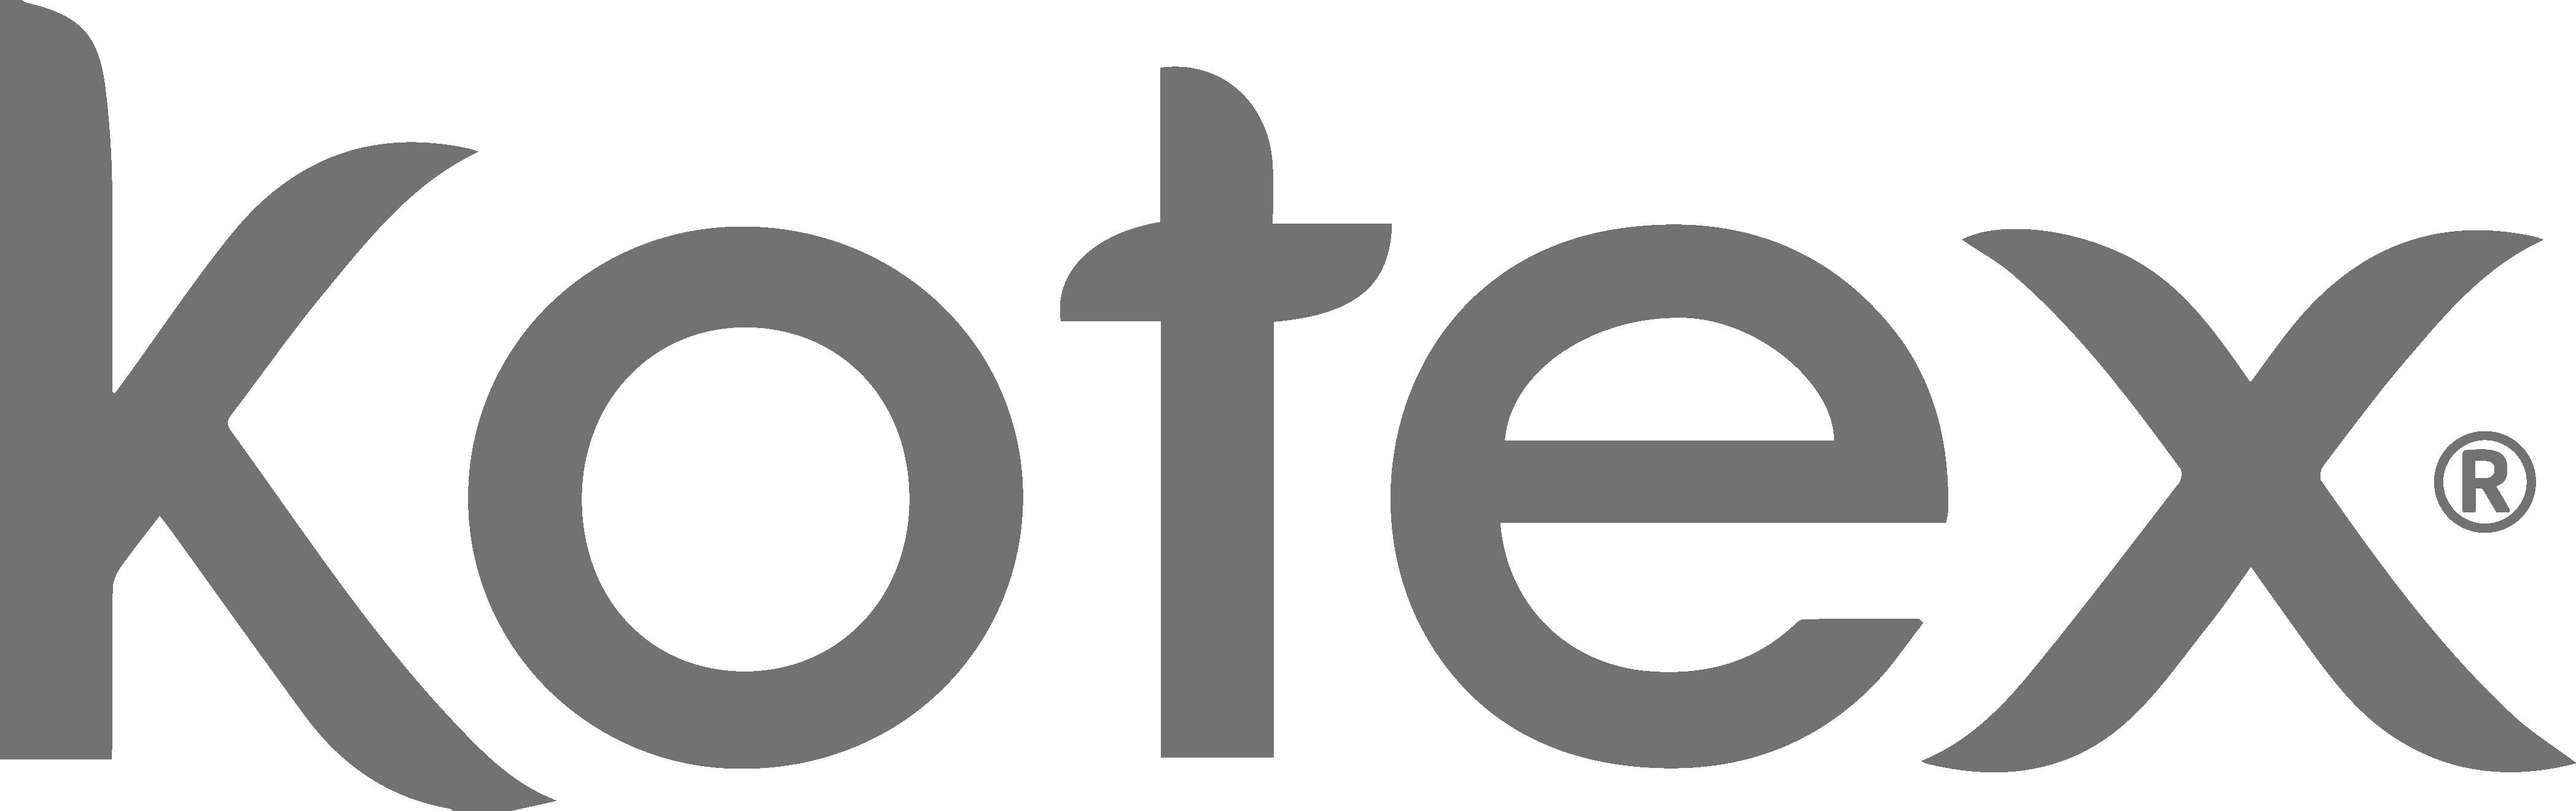 Kotex Logo